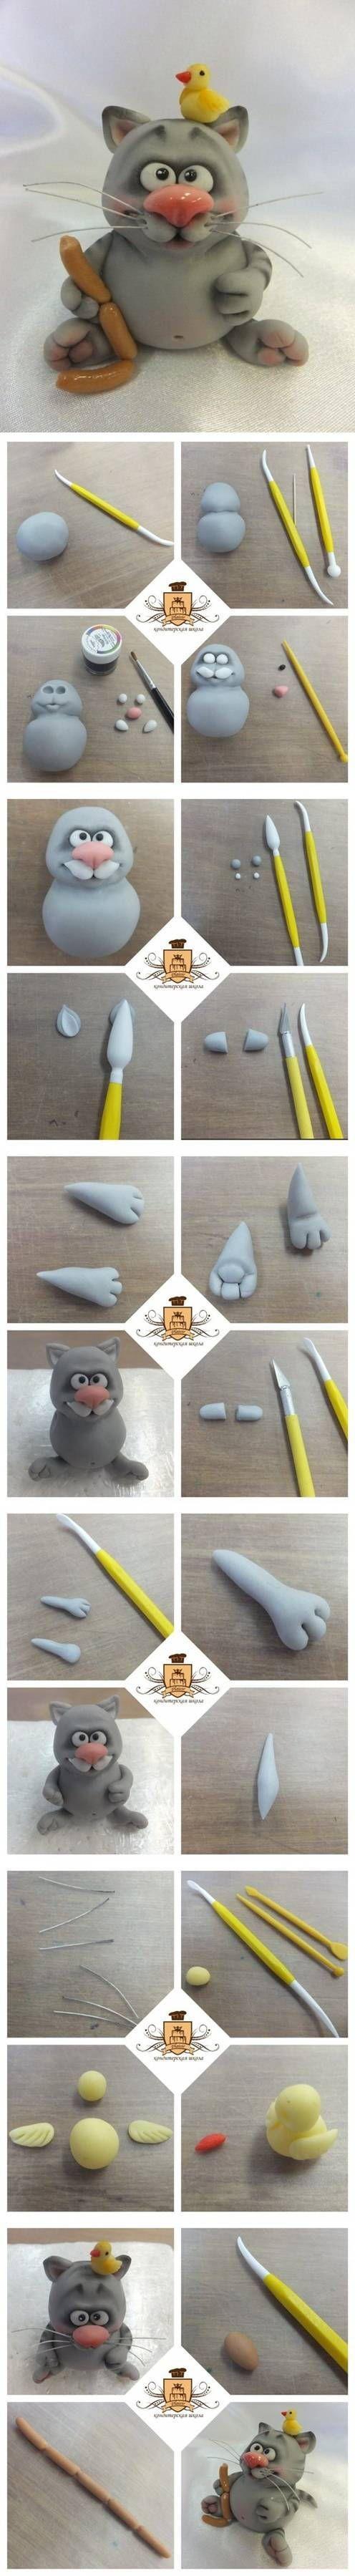 DIY Polymer Clay Cute Cat DIY Projects | UsefulDIY.com Follow Us on Facebook ==> http://www.facebook.com/UsefulDiy